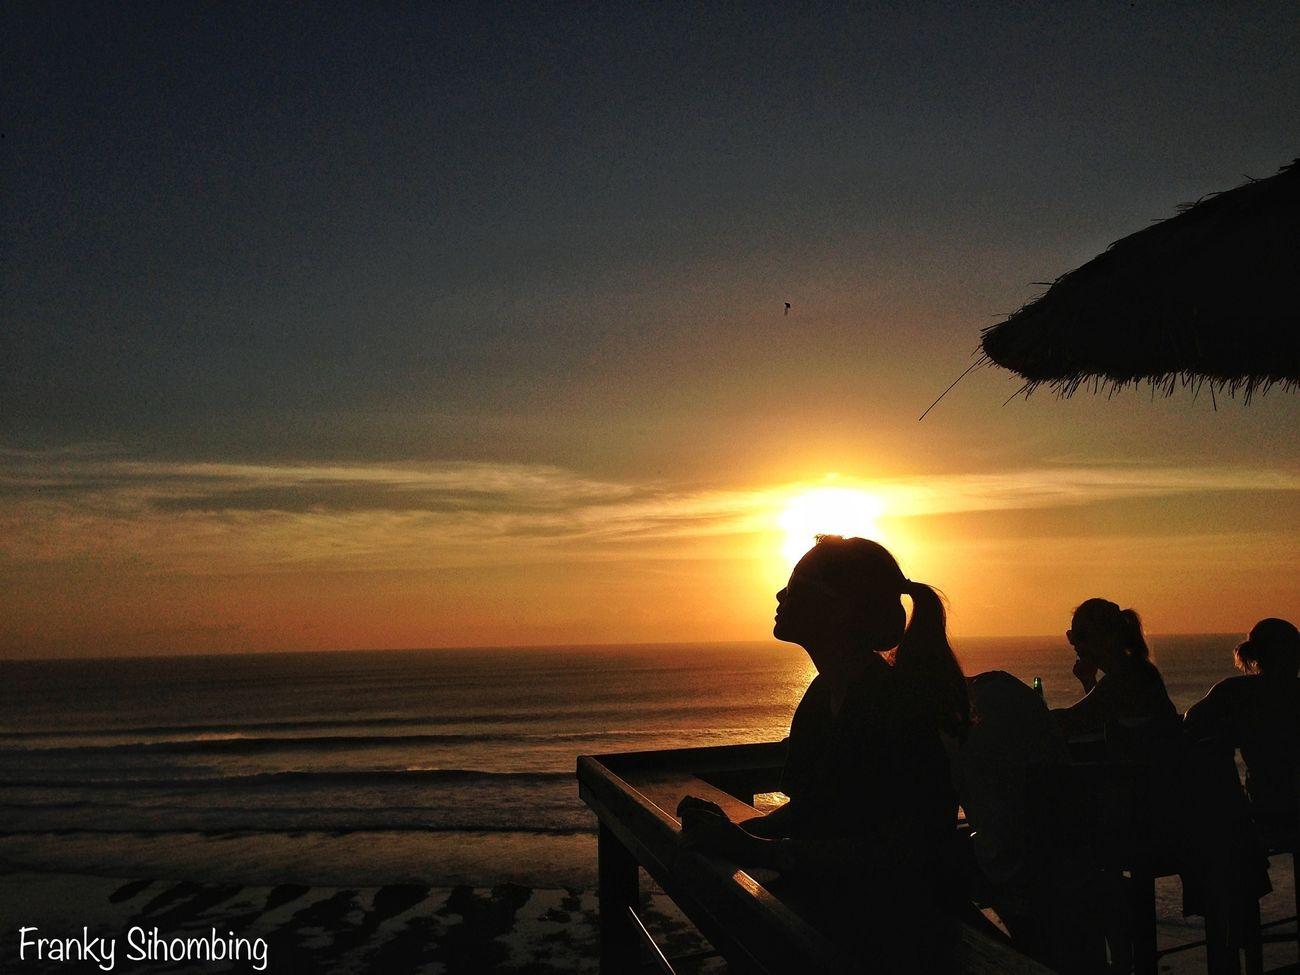 Matahari dan Kamu